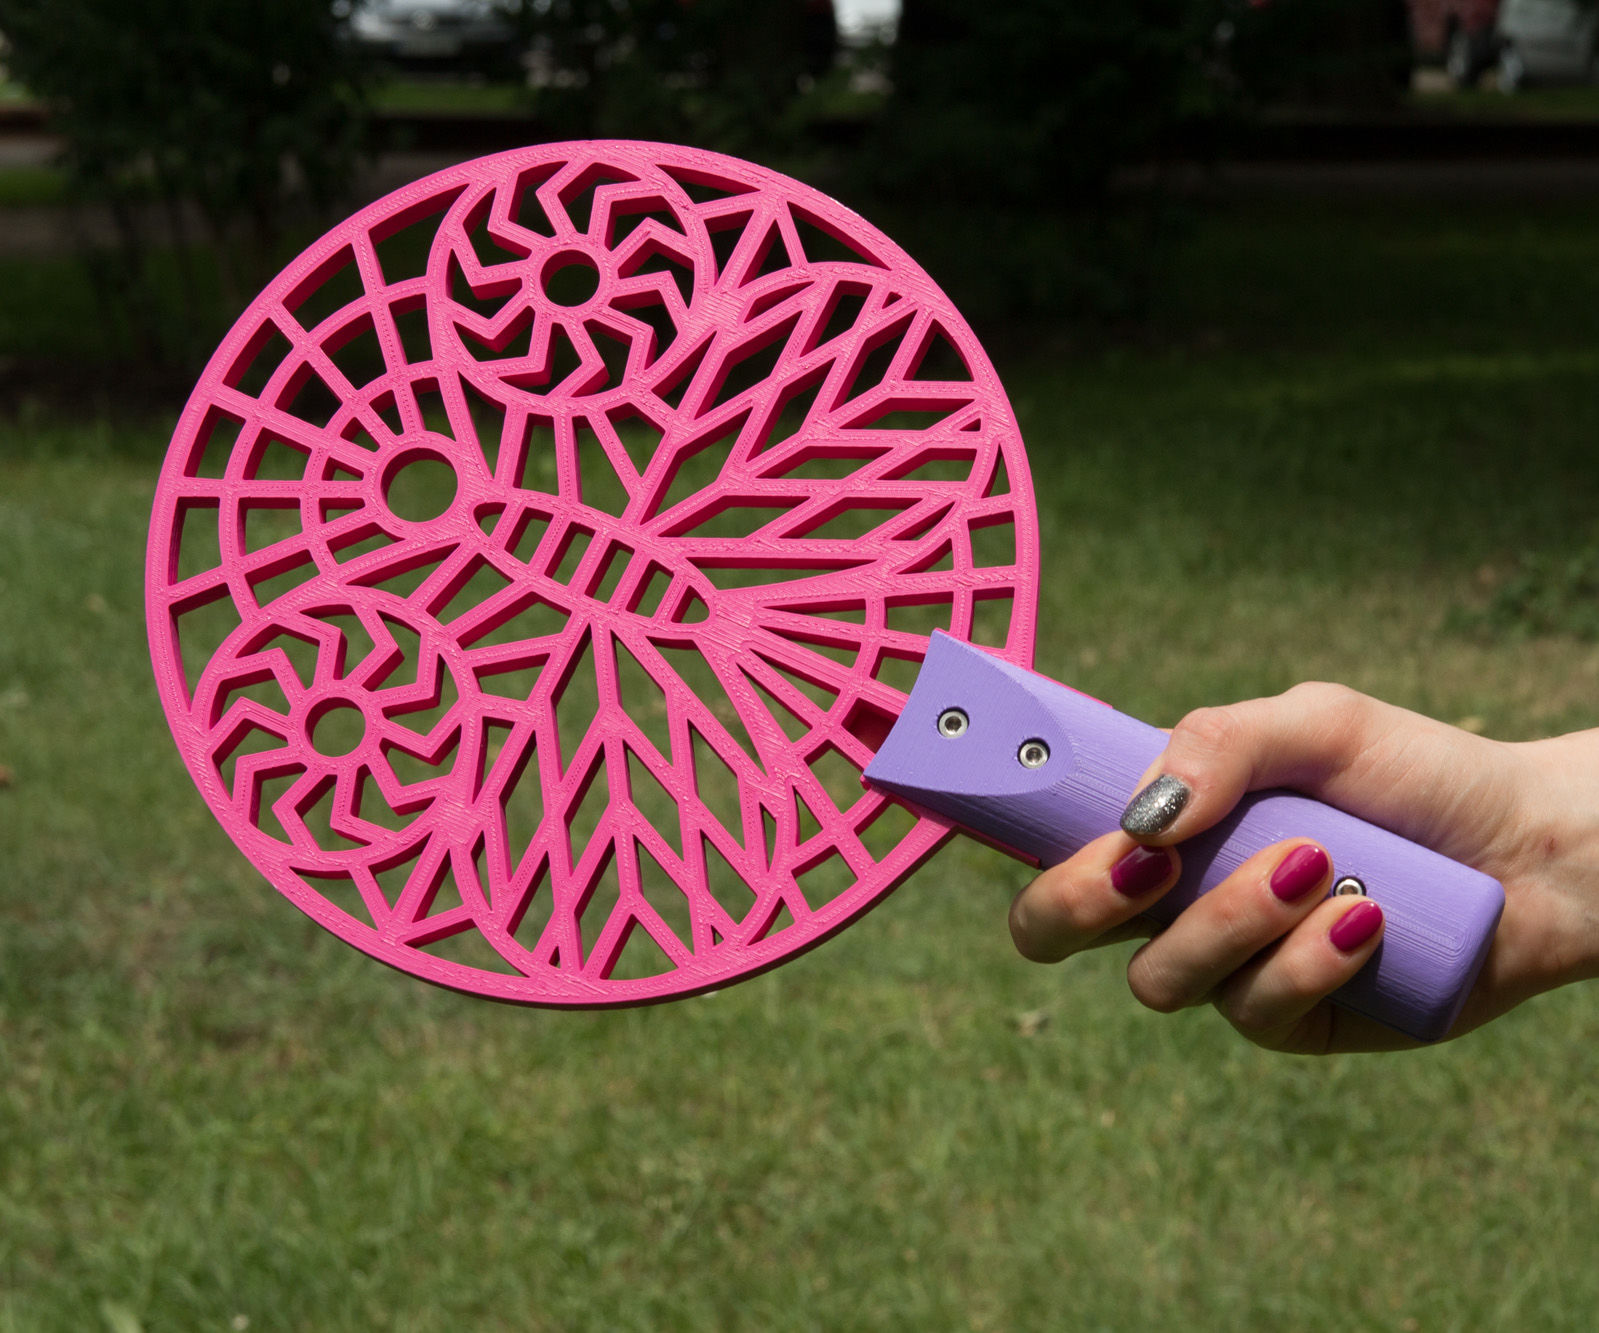 3D Printed Beach Tennis Paddles + Source Files